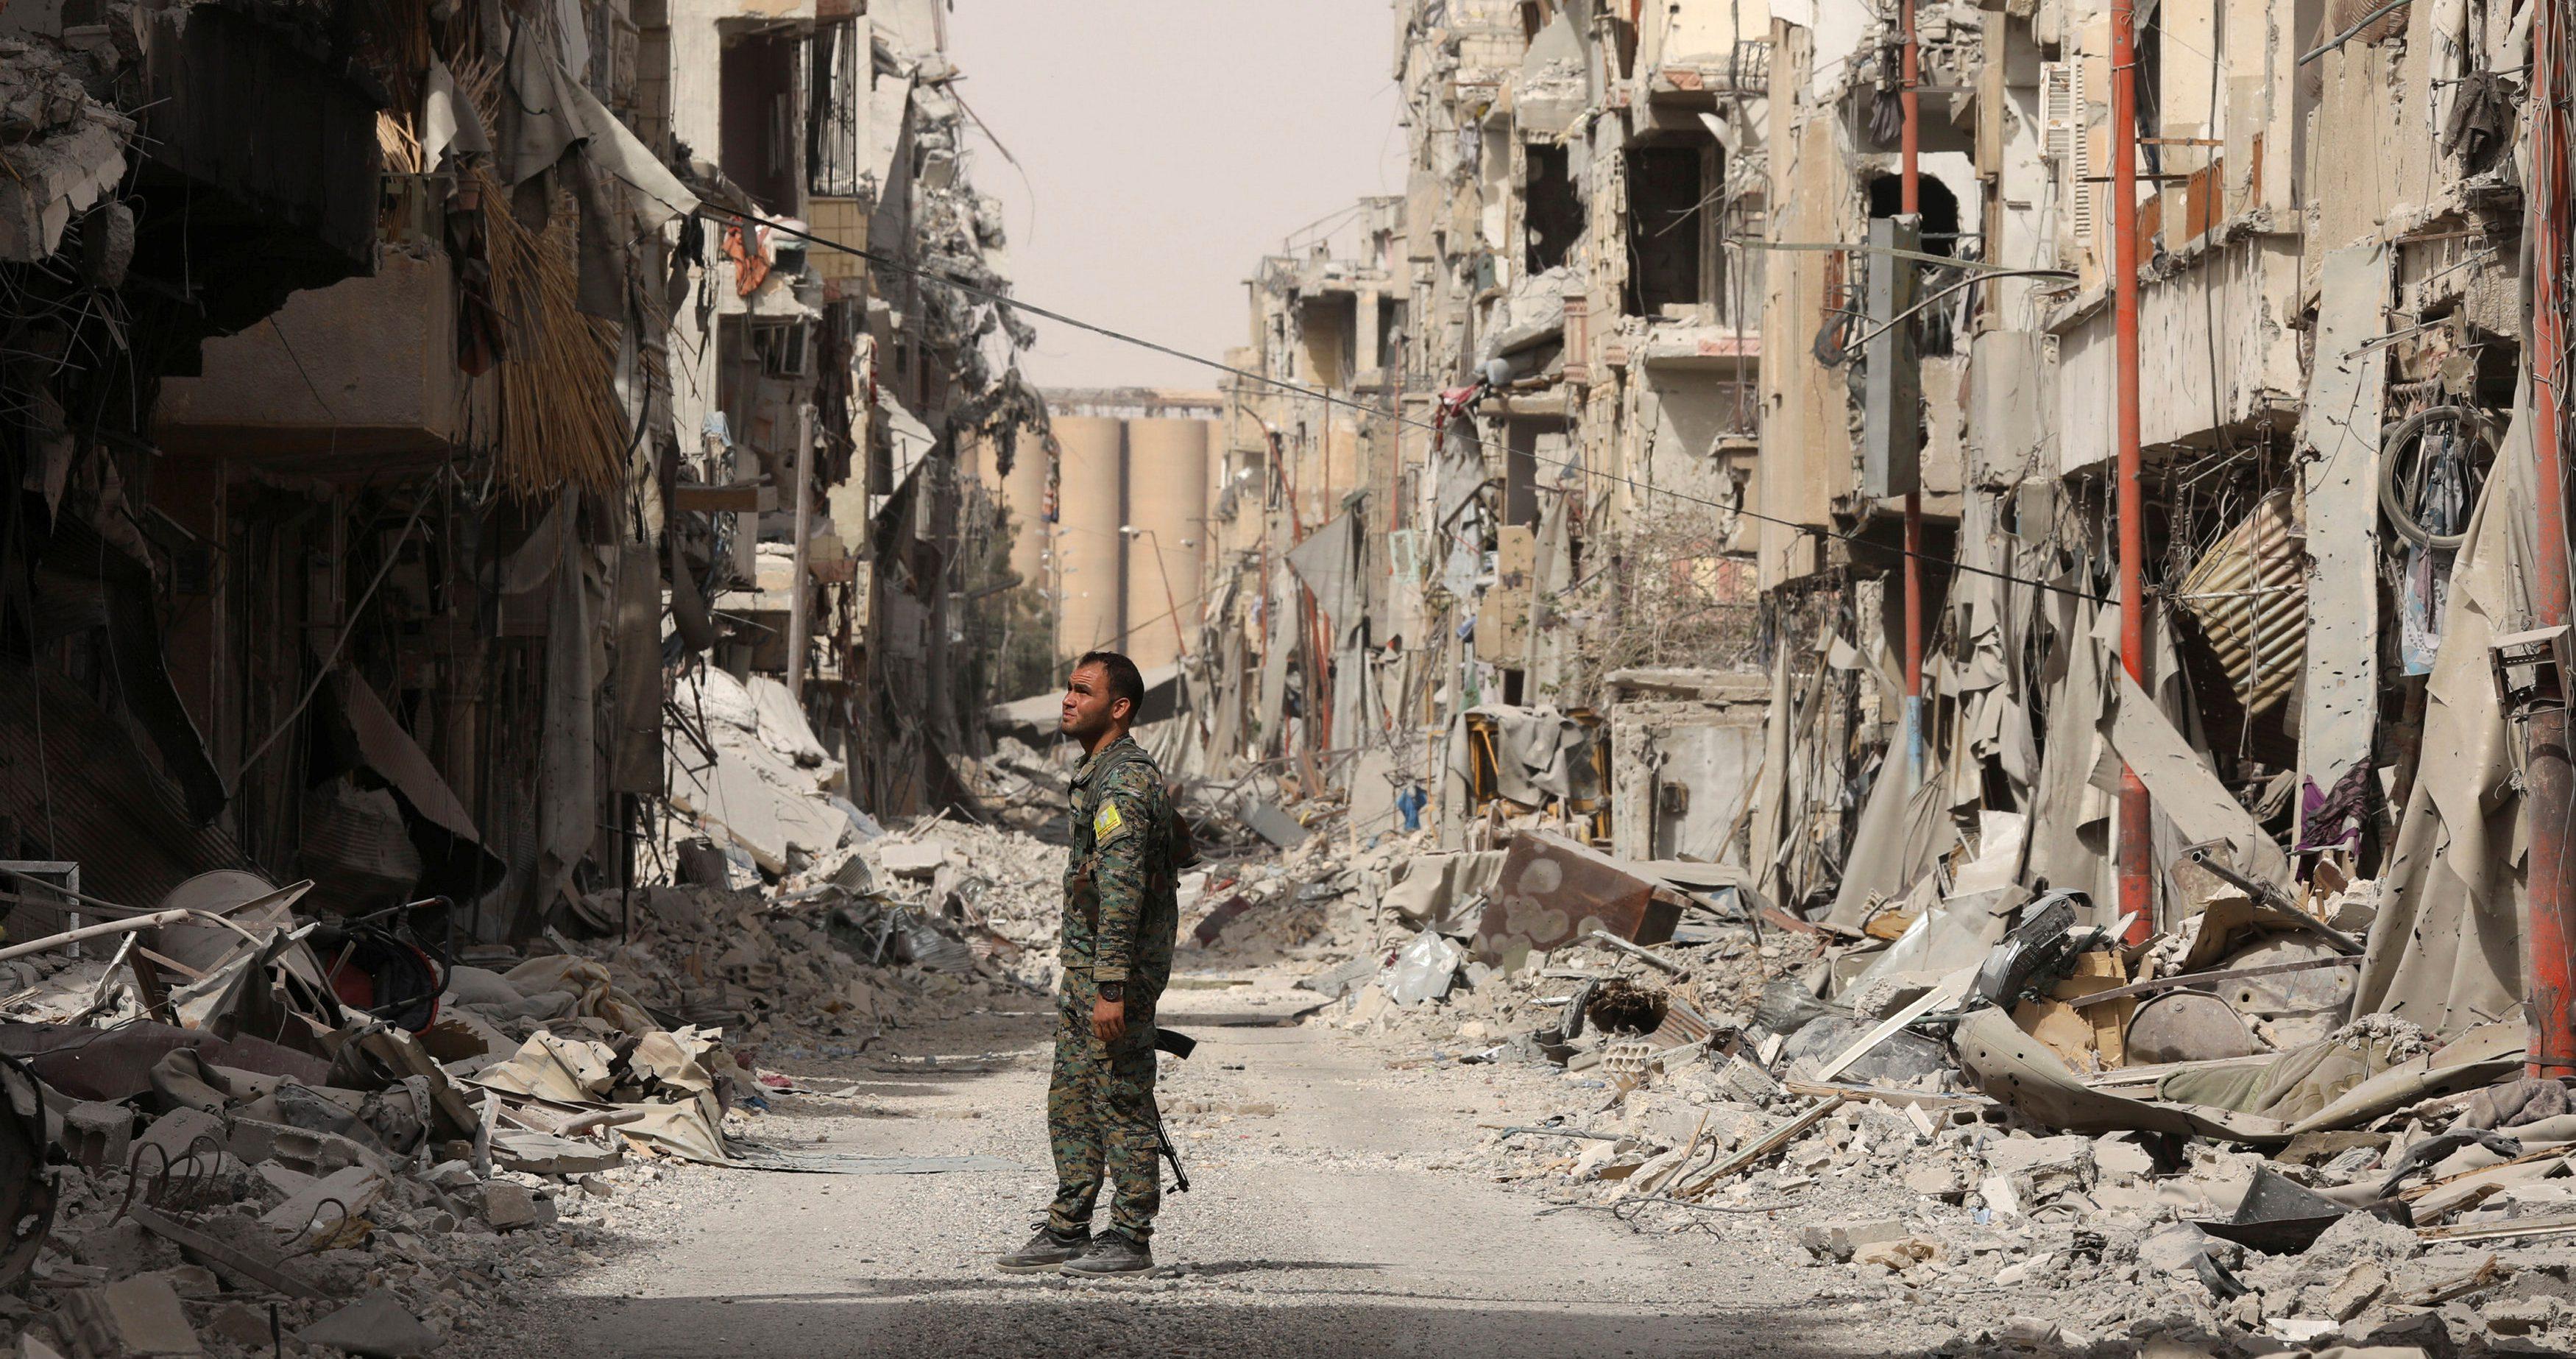 Raqqa news: A visual tour of the destruction in Raqqa, Syria after the —  Quartz